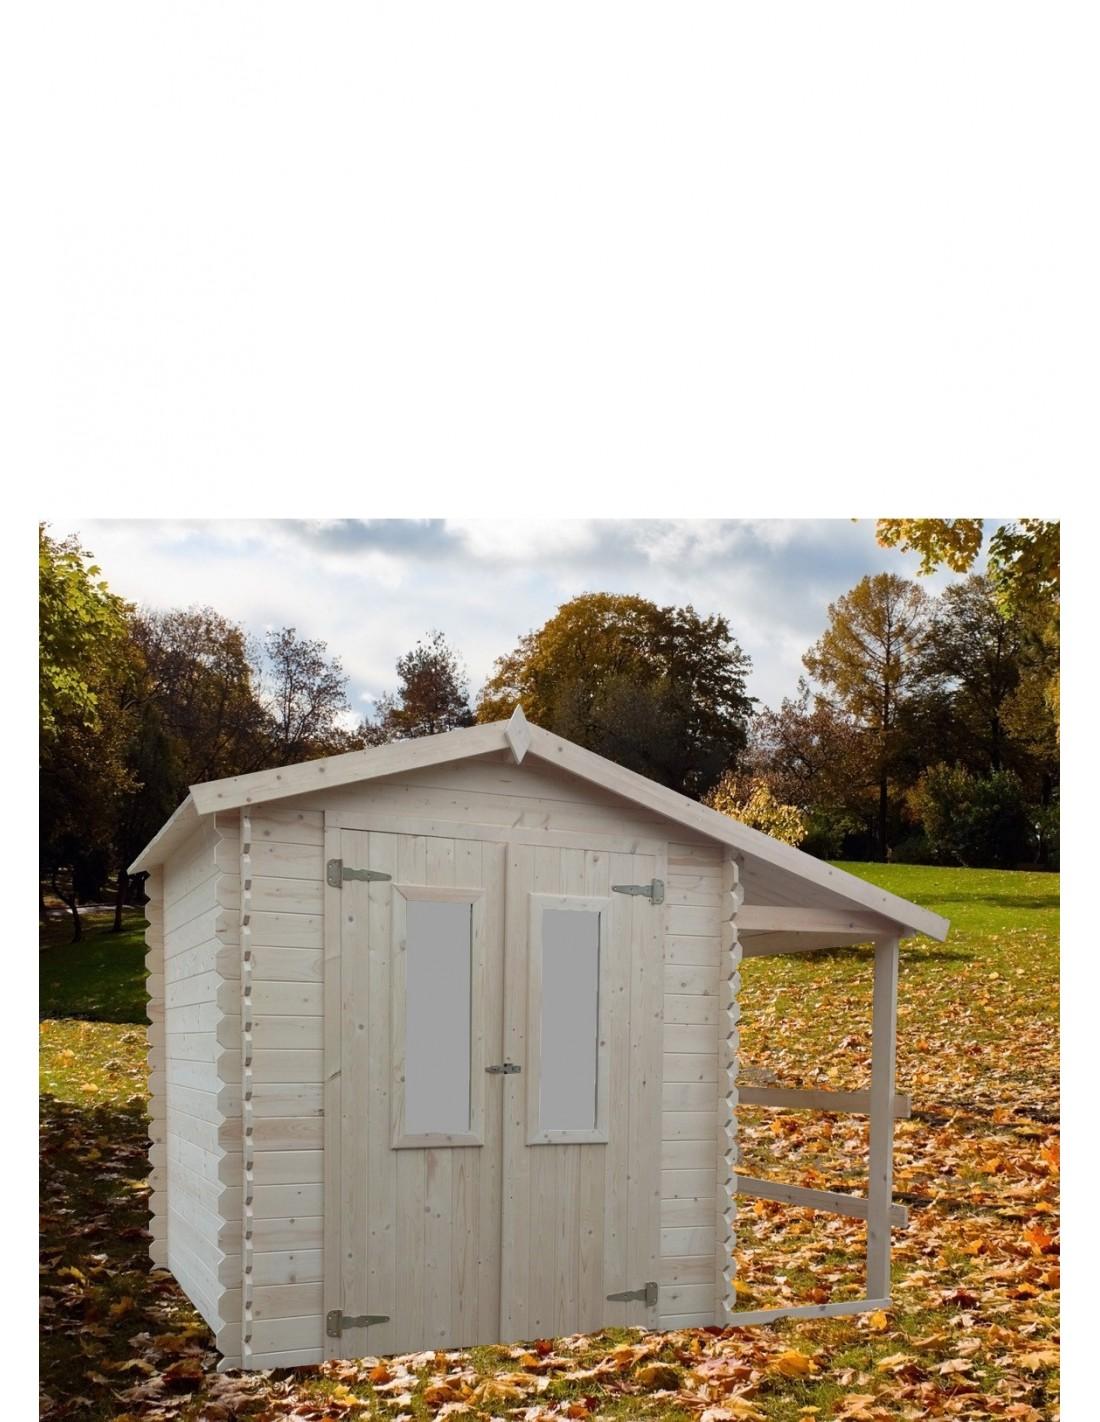 Chalet de jardin en bois 2x2m avec bucher p 19mm2 for Chalet jardin en bois